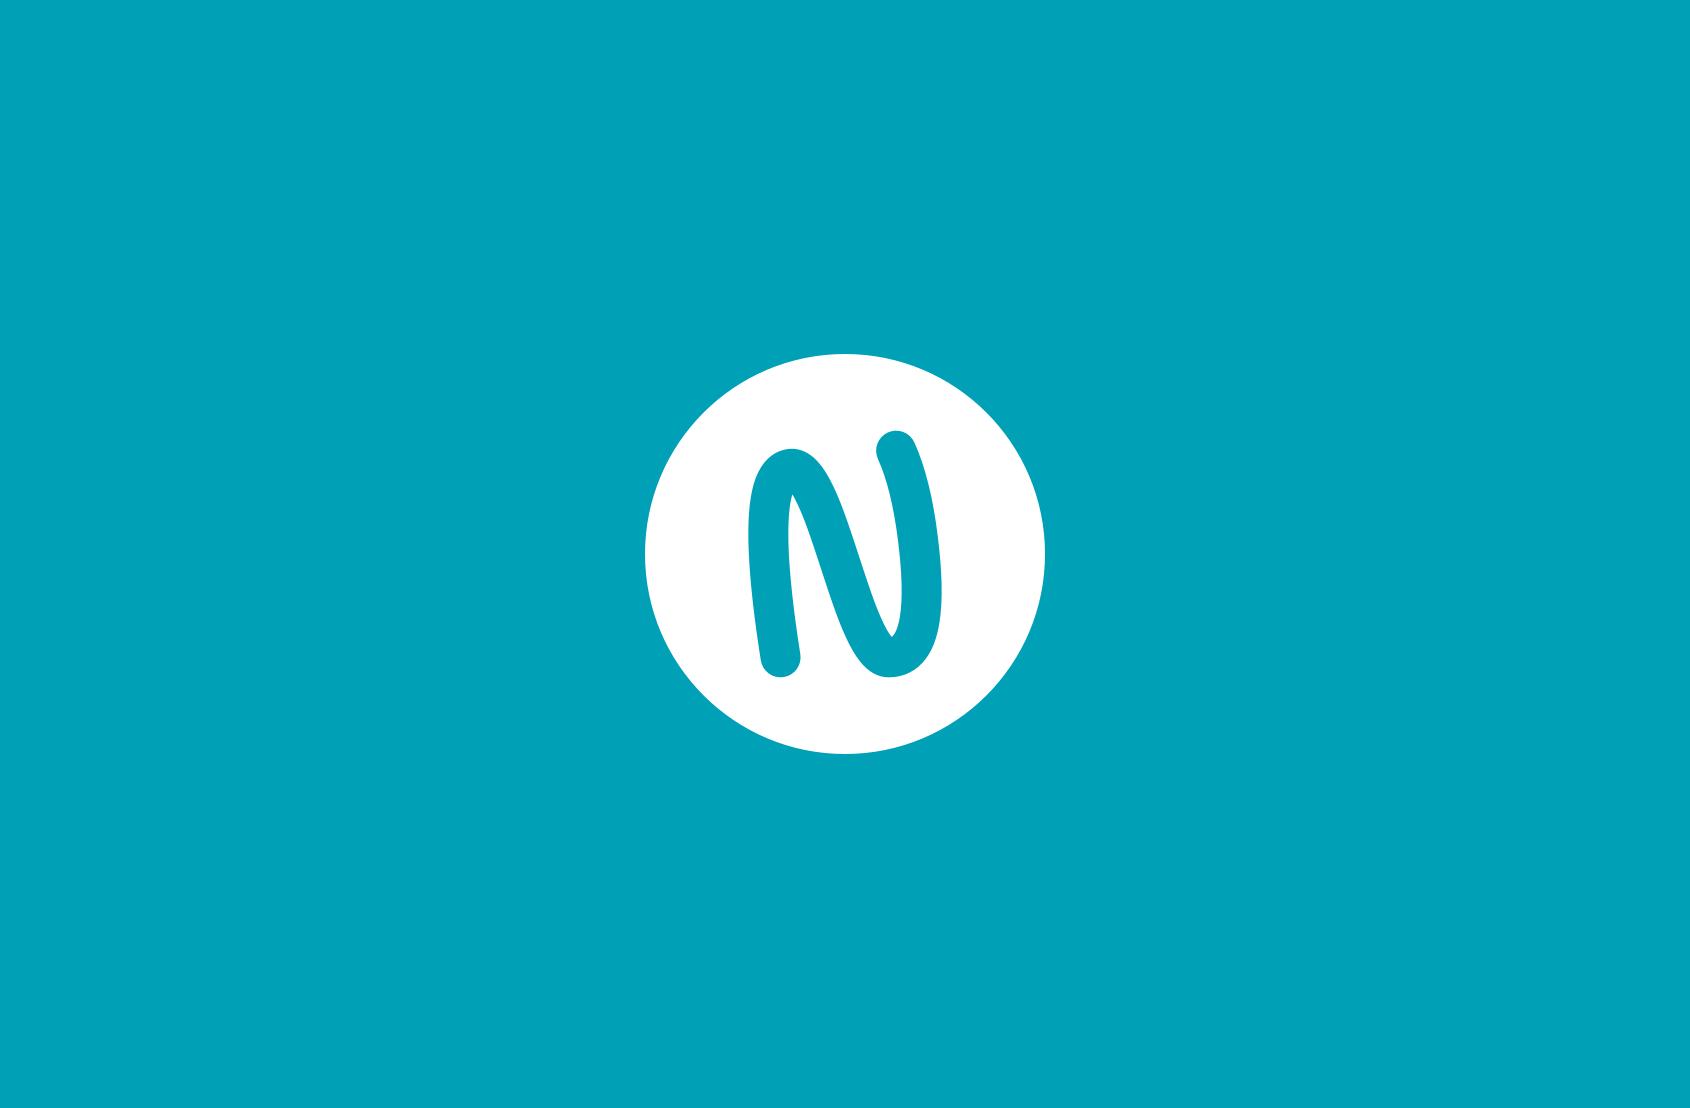 Nimbus Note short logo png